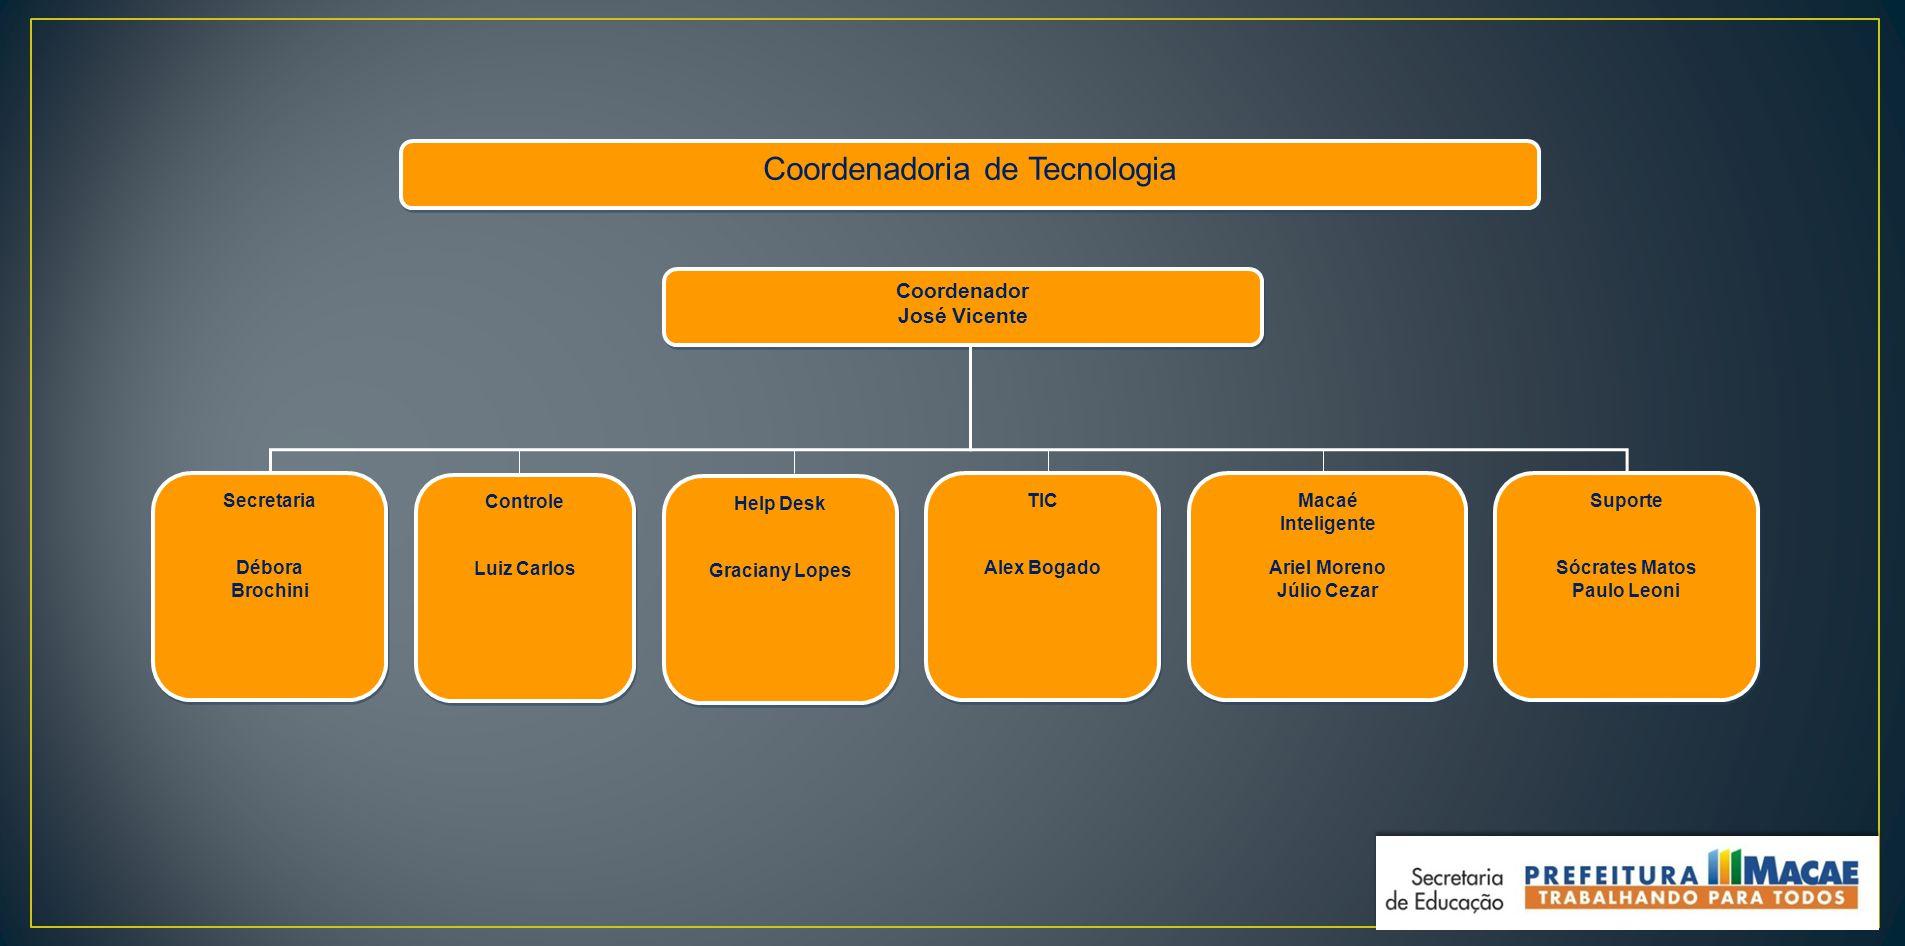 Coordenadoria de Tecnologia